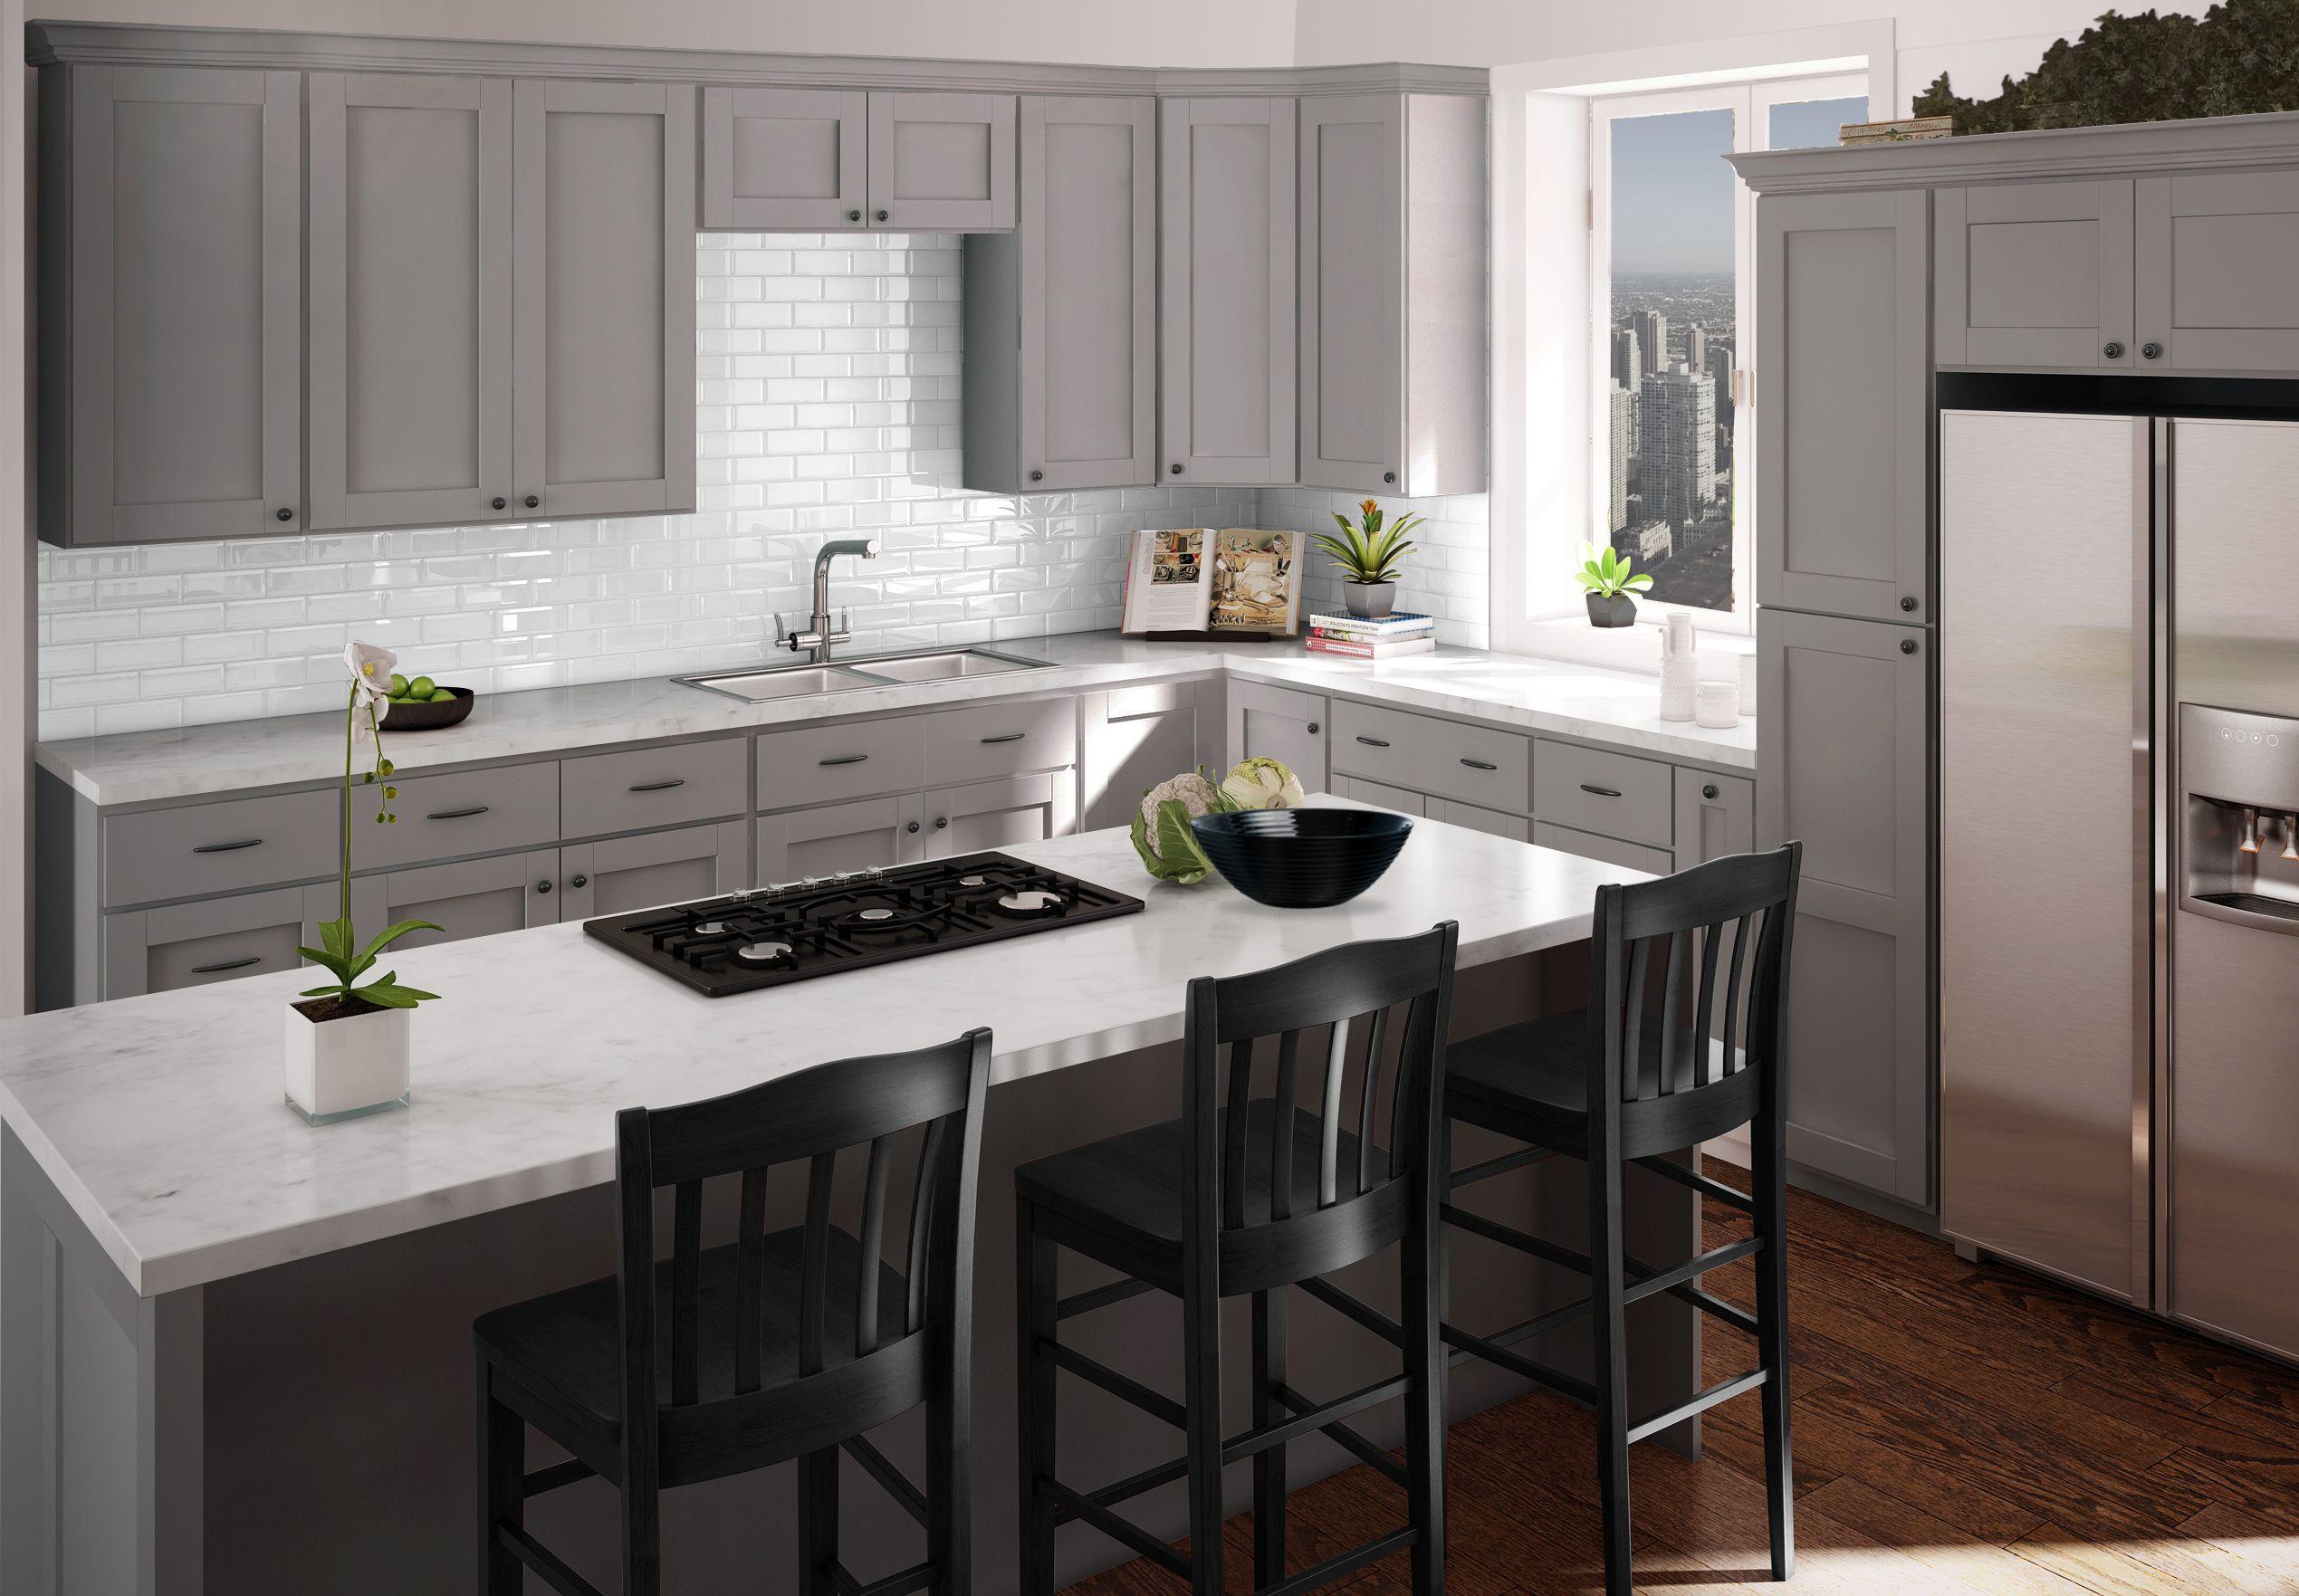 Grayson Kitchen Cabinet Collection Best Kitchen Cabinets Kitchen Cabinets Kitchen Interior